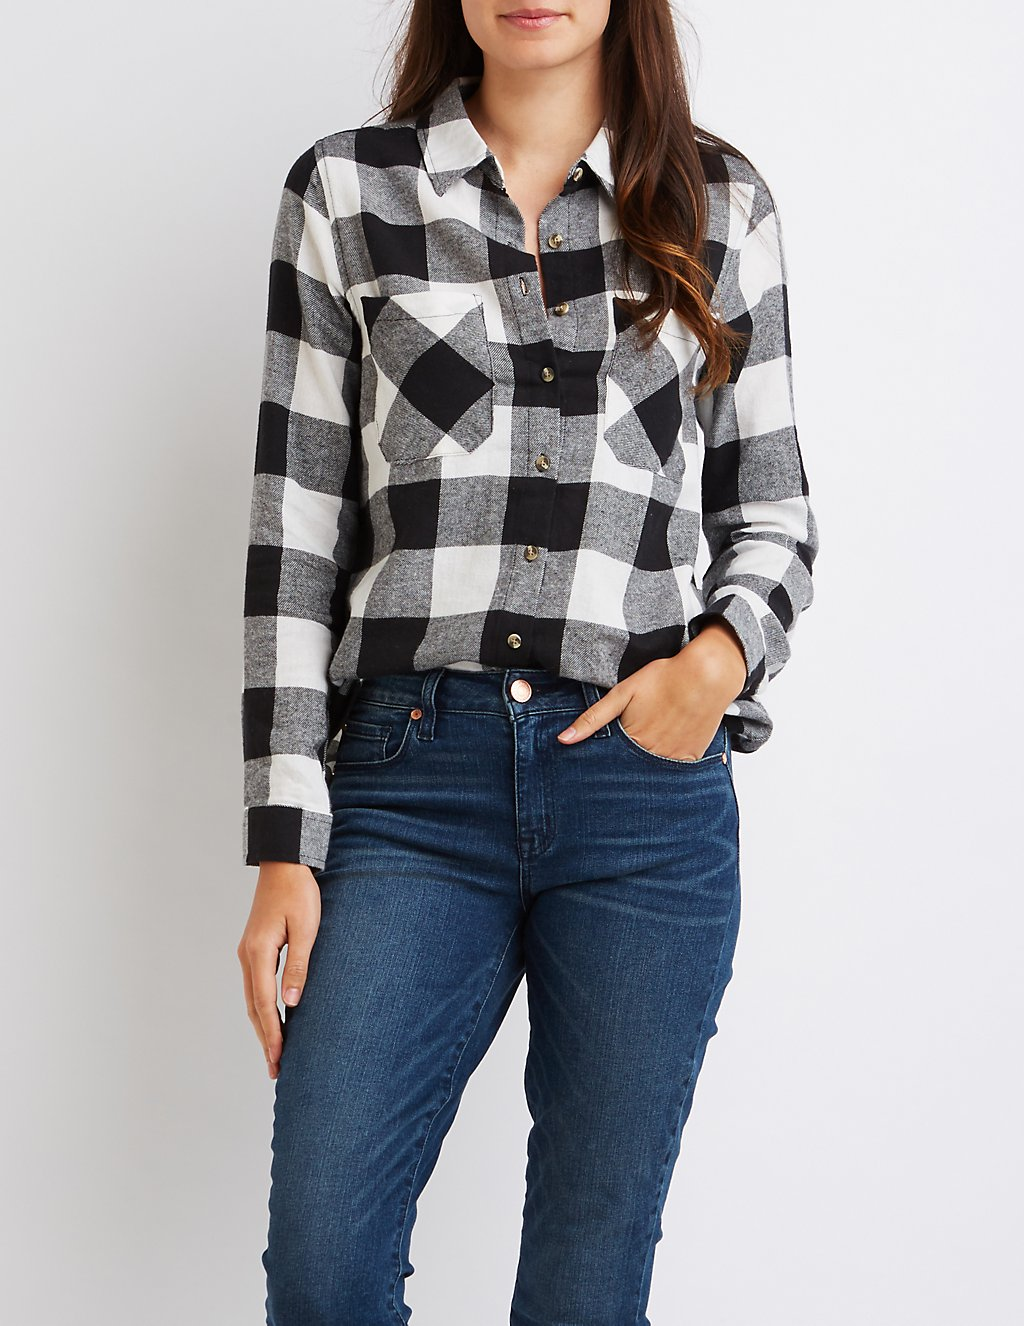 ralph lauren for less - woman wearing buffalo plaid shirt